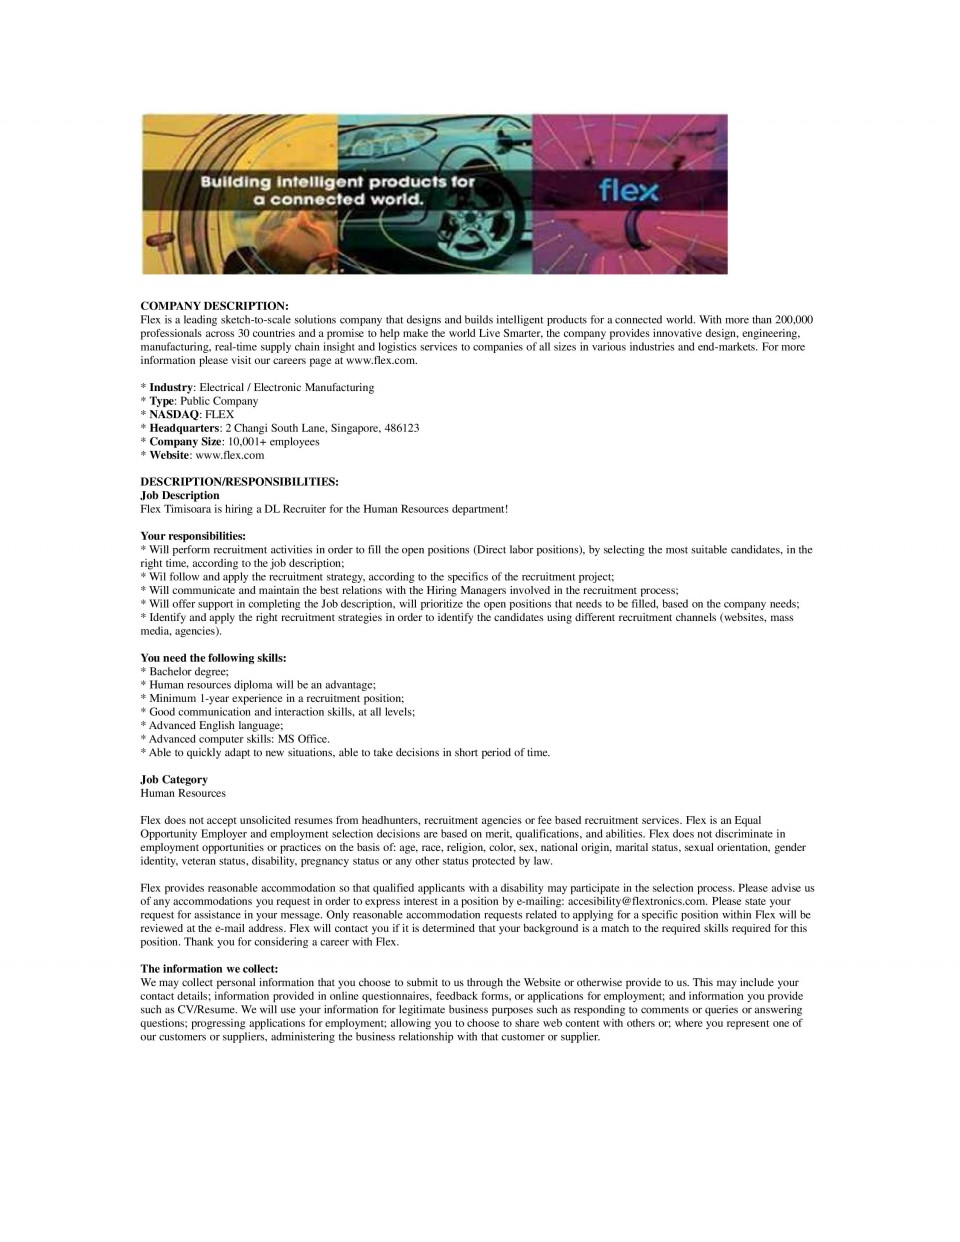 Recruiter - WD041316